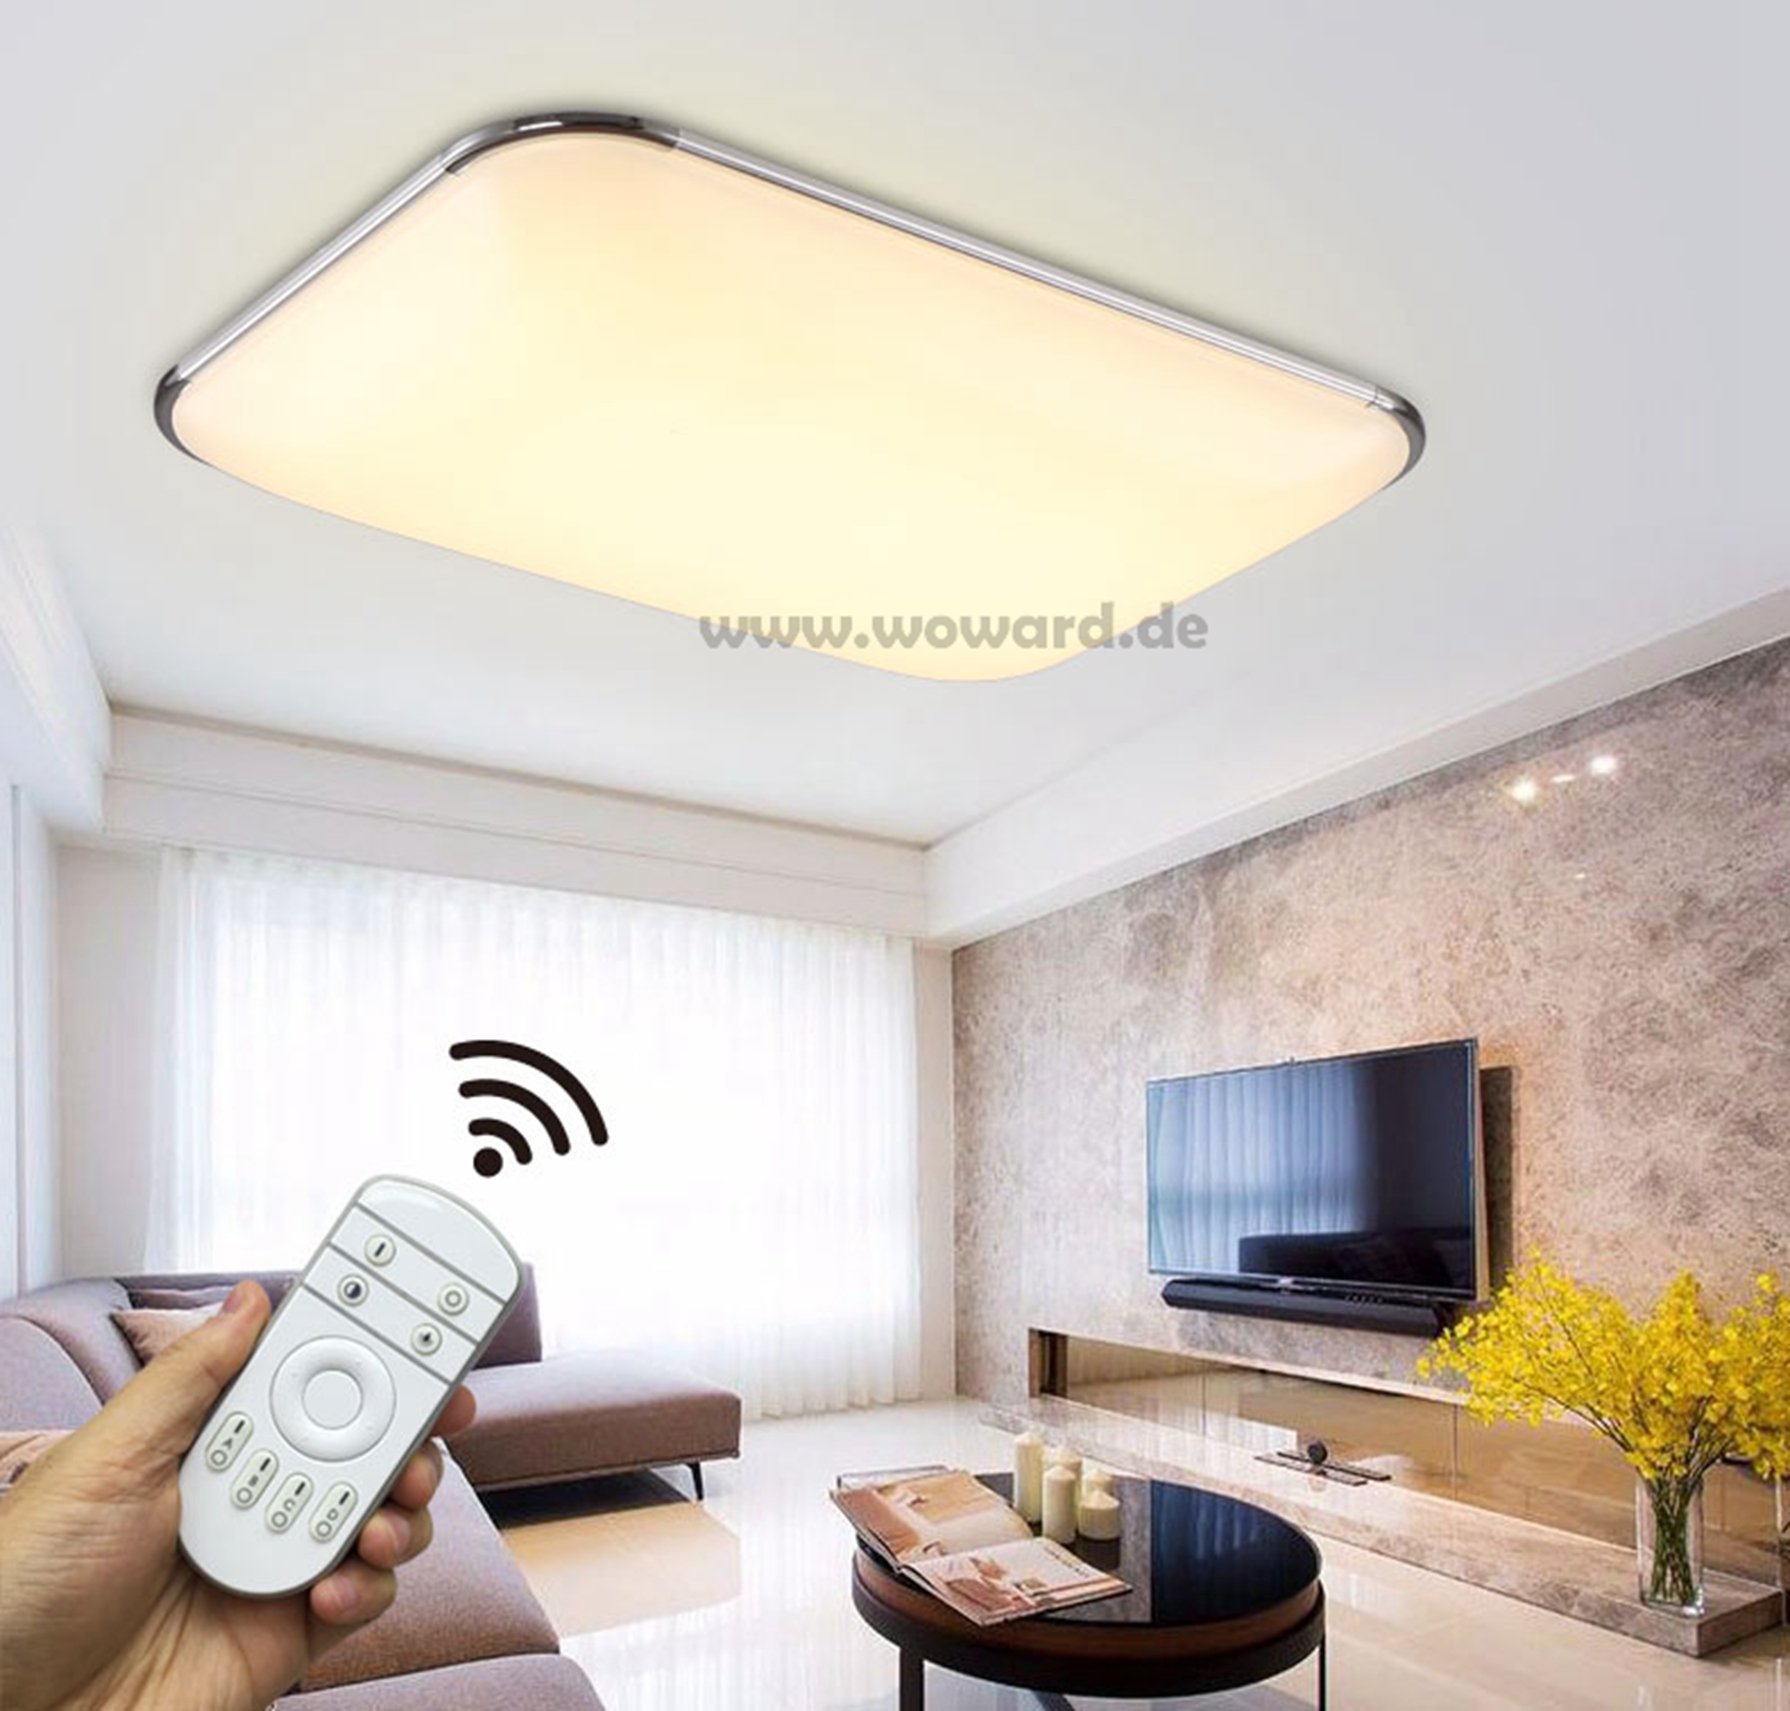 led deckenlampe deckenleuchte 12 90w dimmbar wand lampe. Black Bedroom Furniture Sets. Home Design Ideas